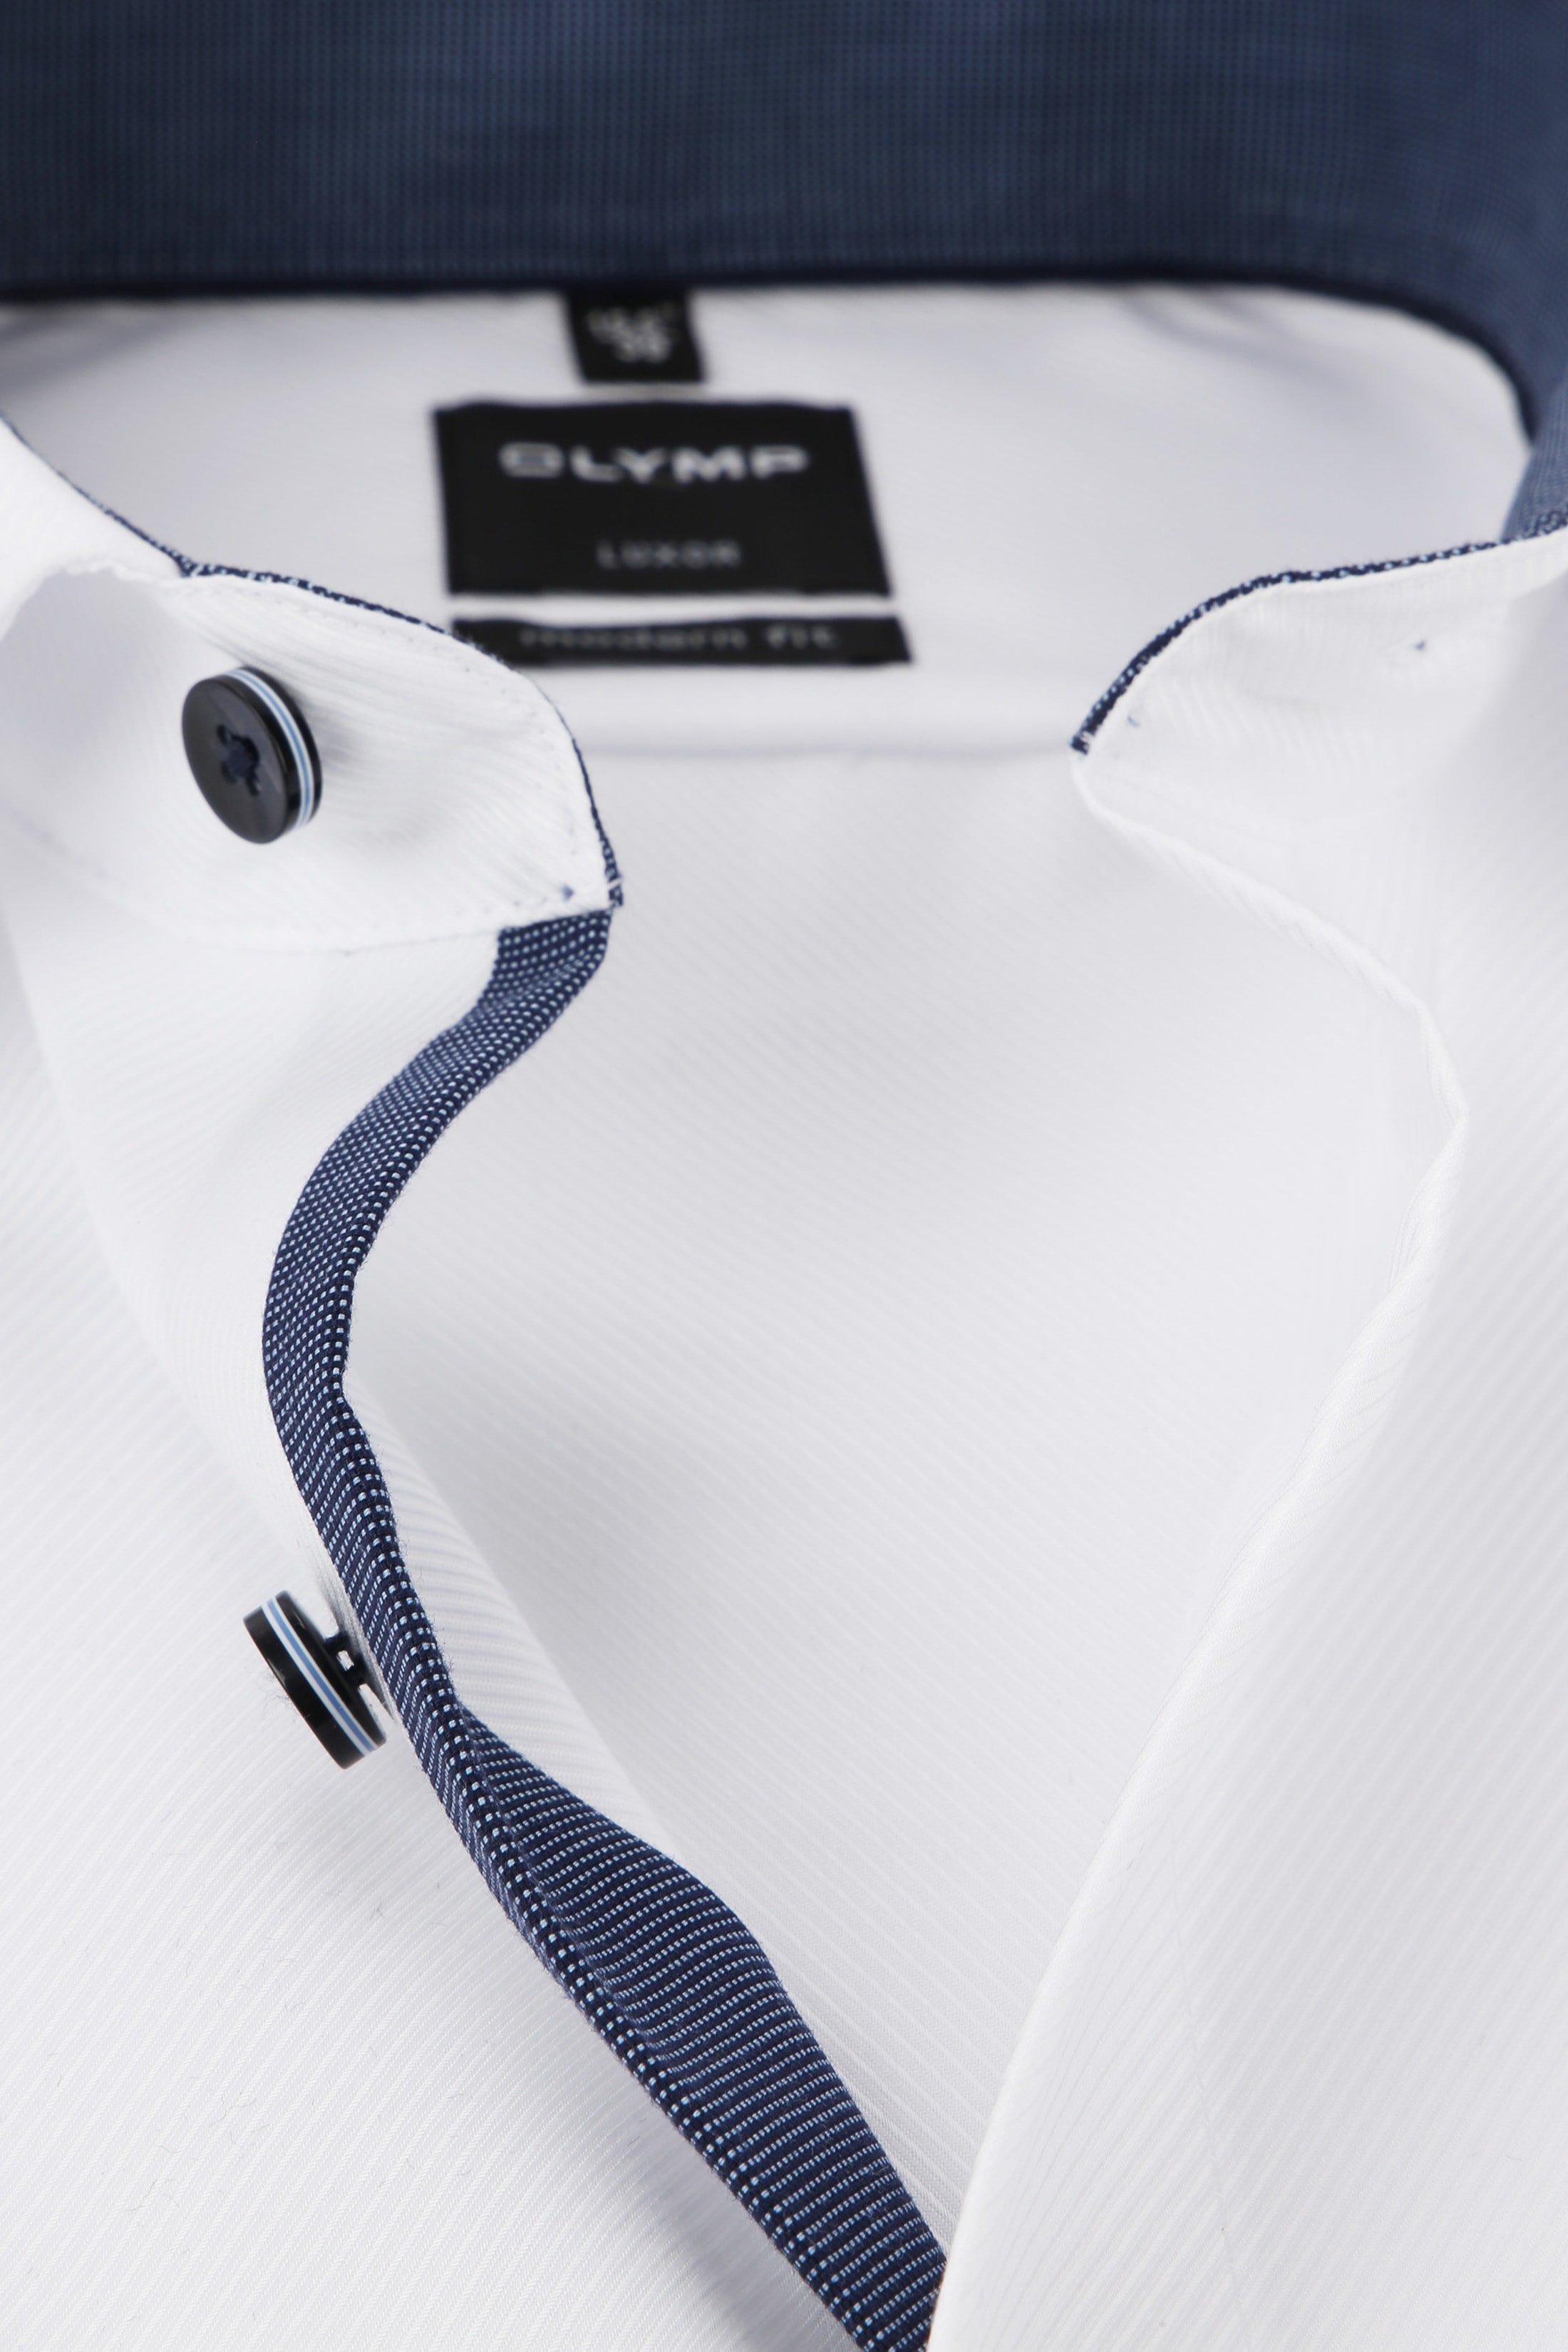 OLYMP Luxor MF Overhemd Wit foto 1